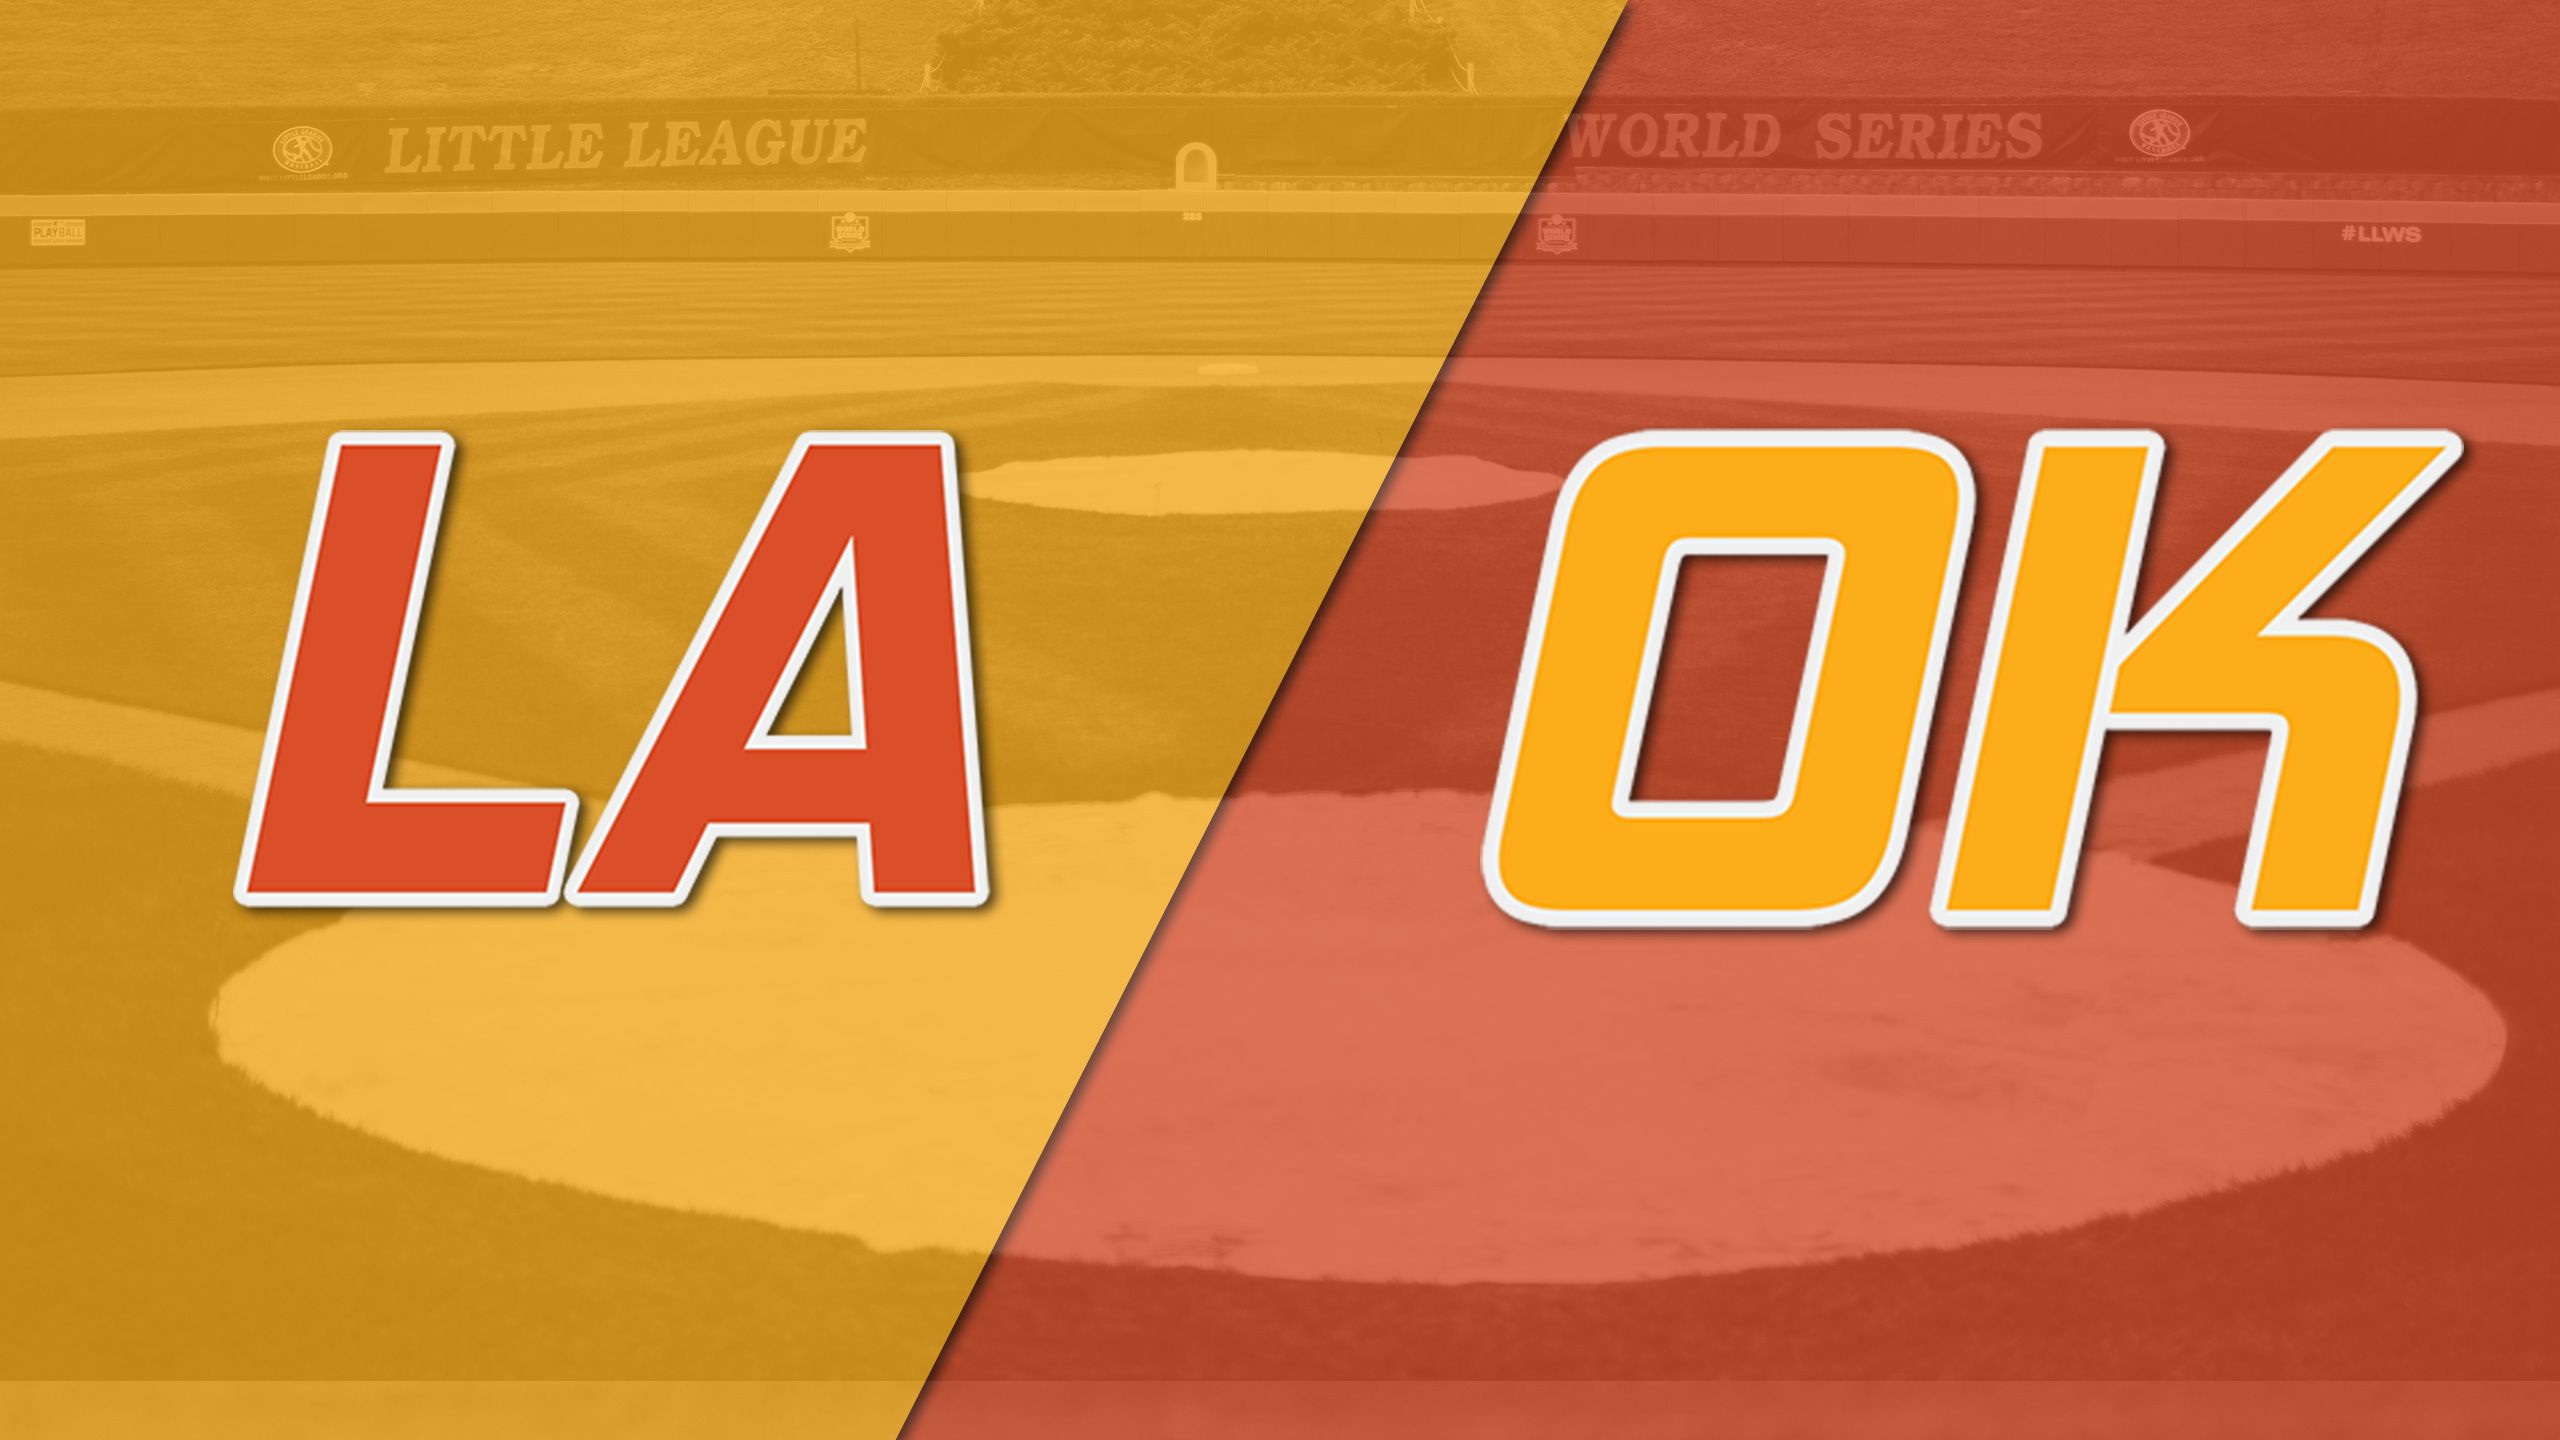 River Ridge, LA vs. Tulsa, OK (Game #3)